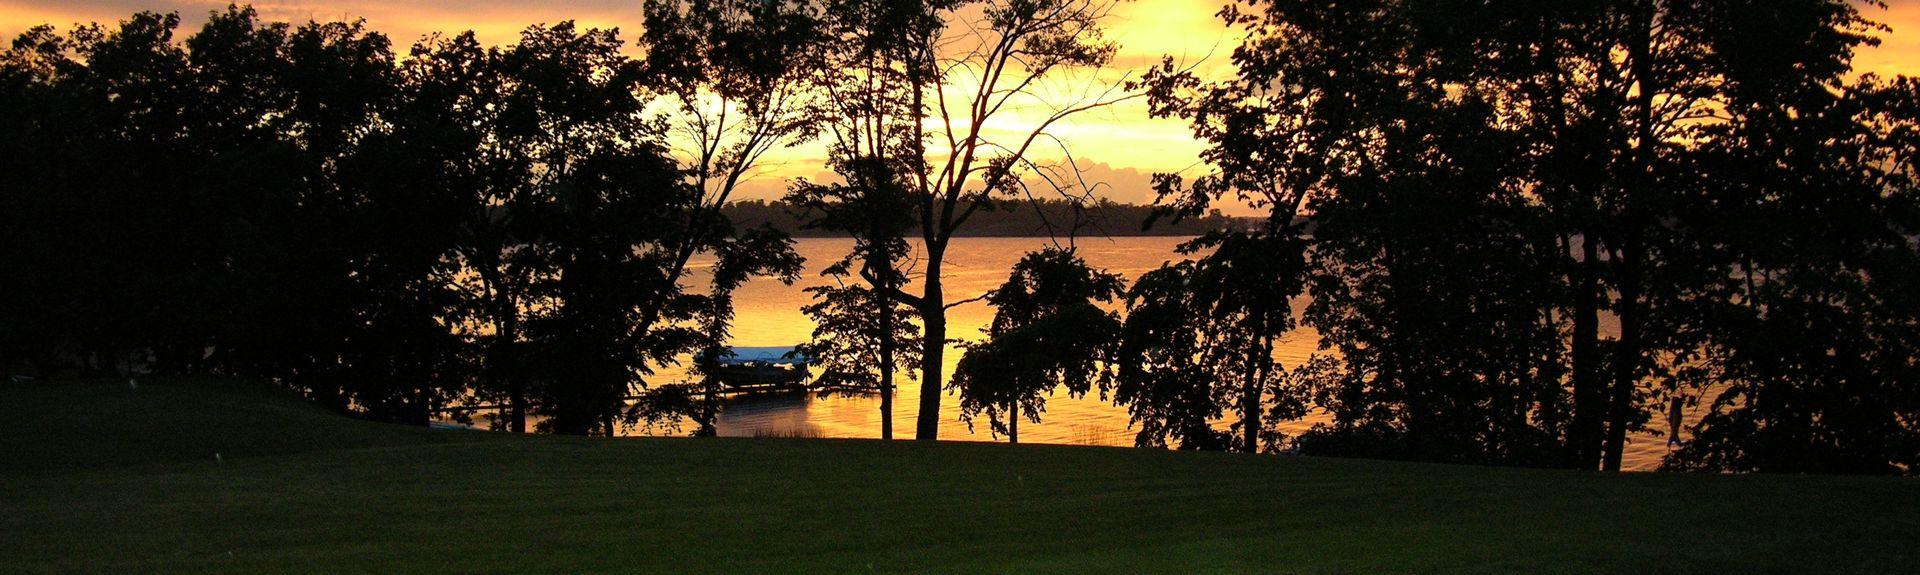 Lake Park, Minnesota, USA